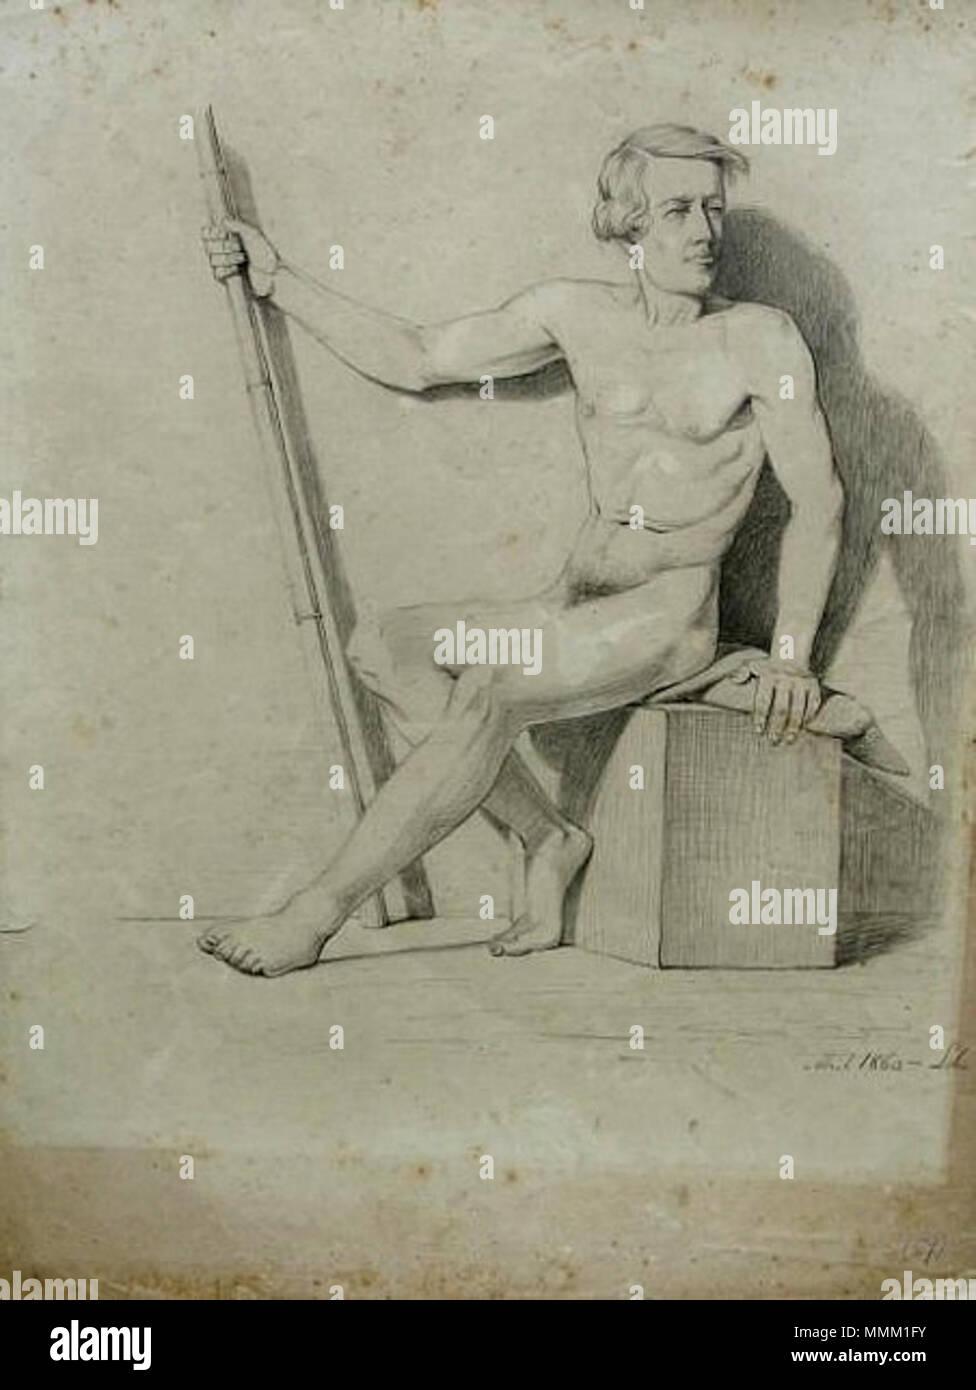 Antônio de Sousa Lobo - Nu masculino sentado Imagen De Stock